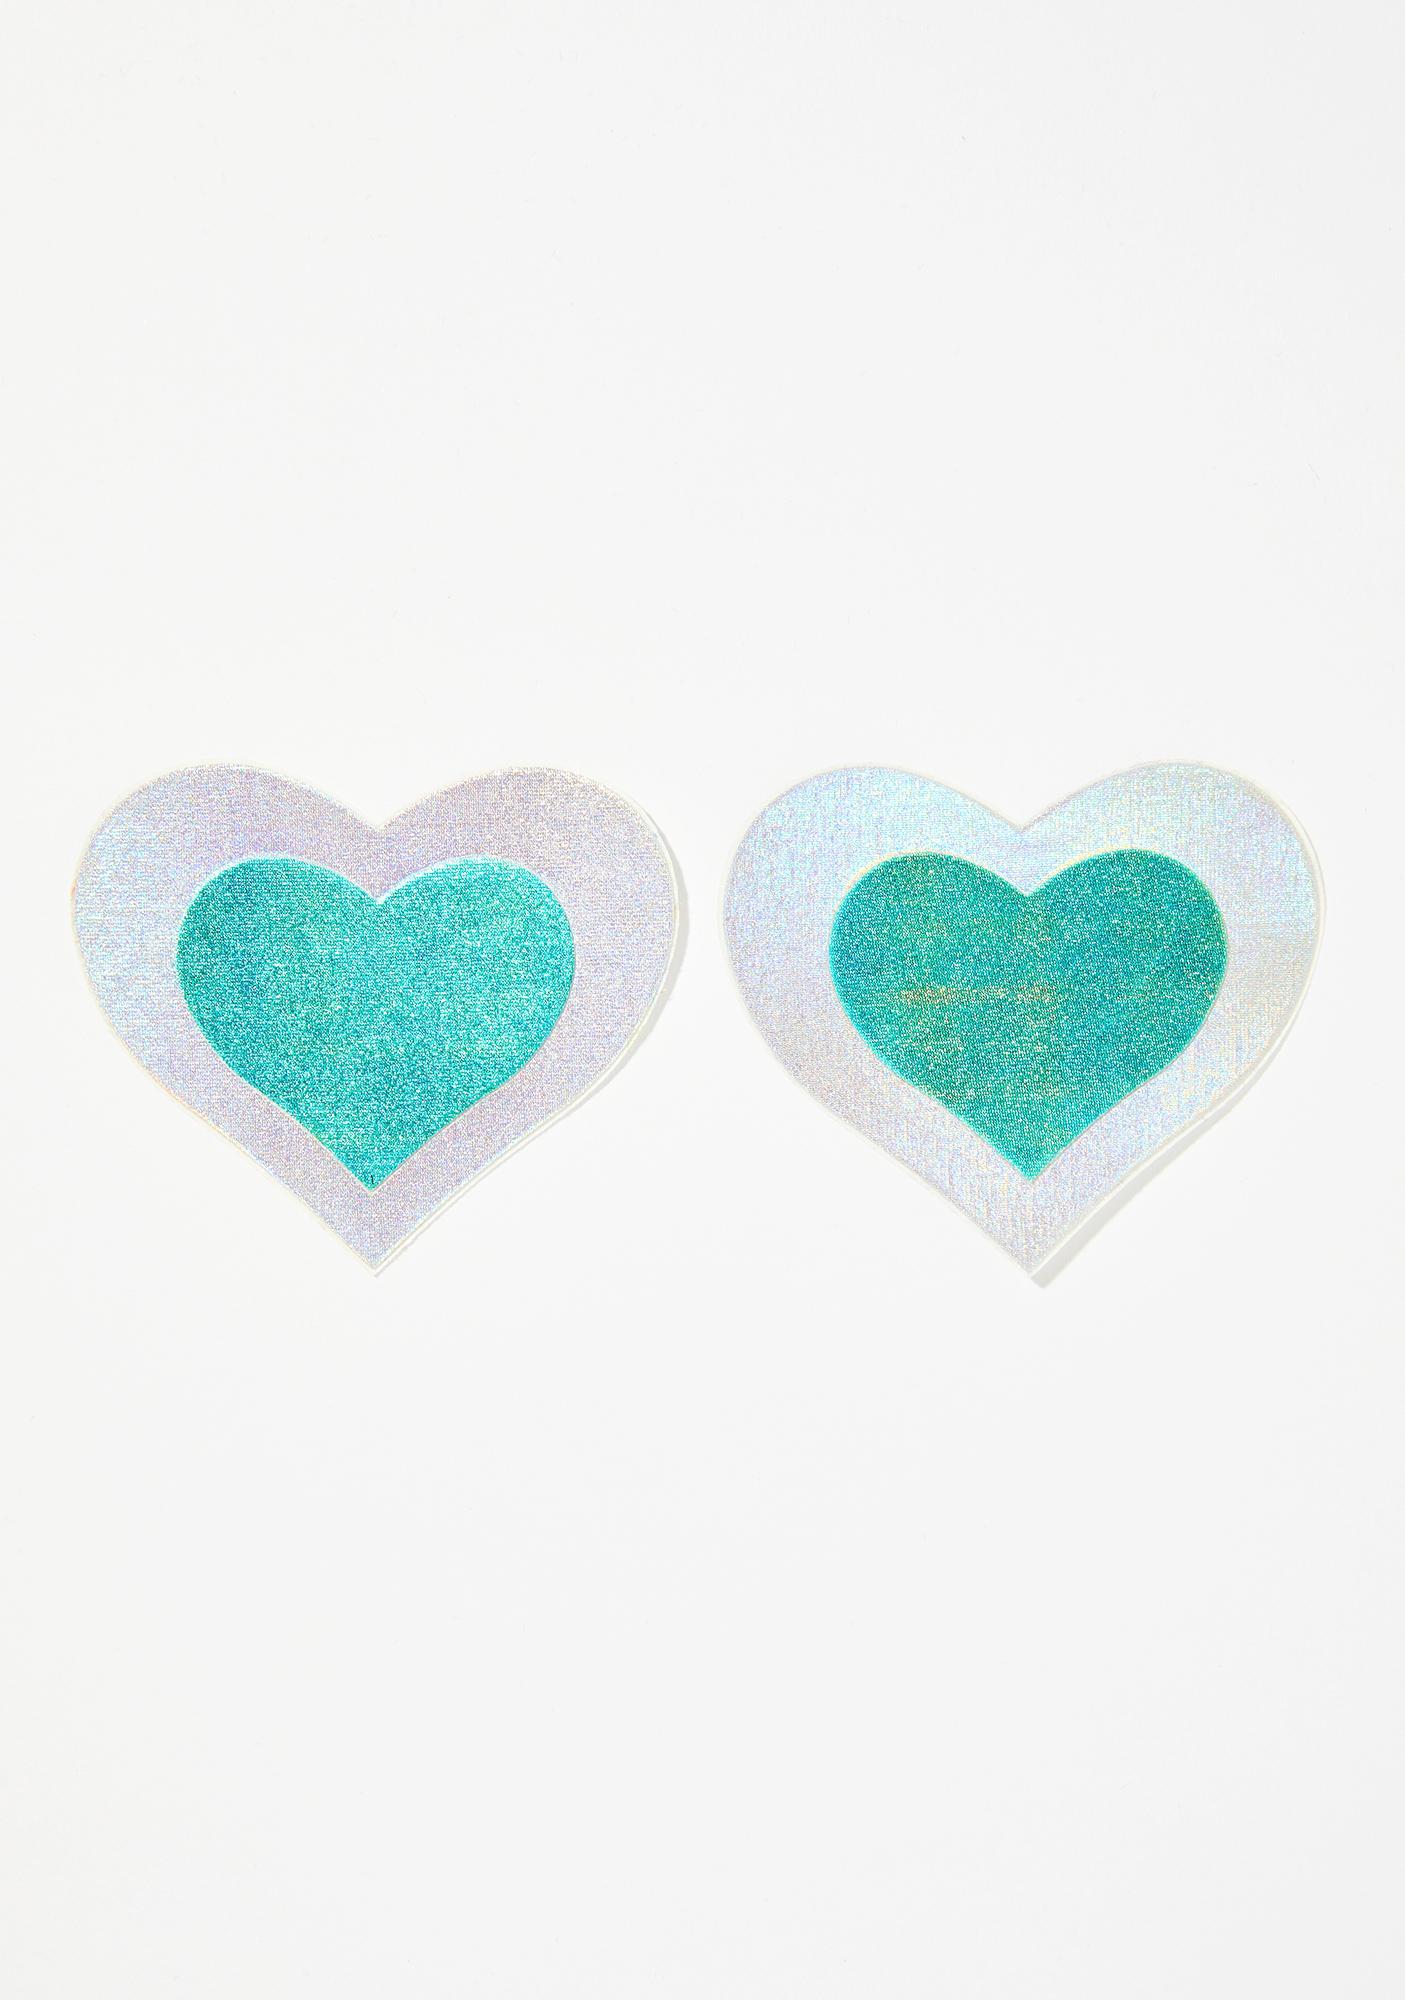 Pastease Aqua Heart Holographic Pasties